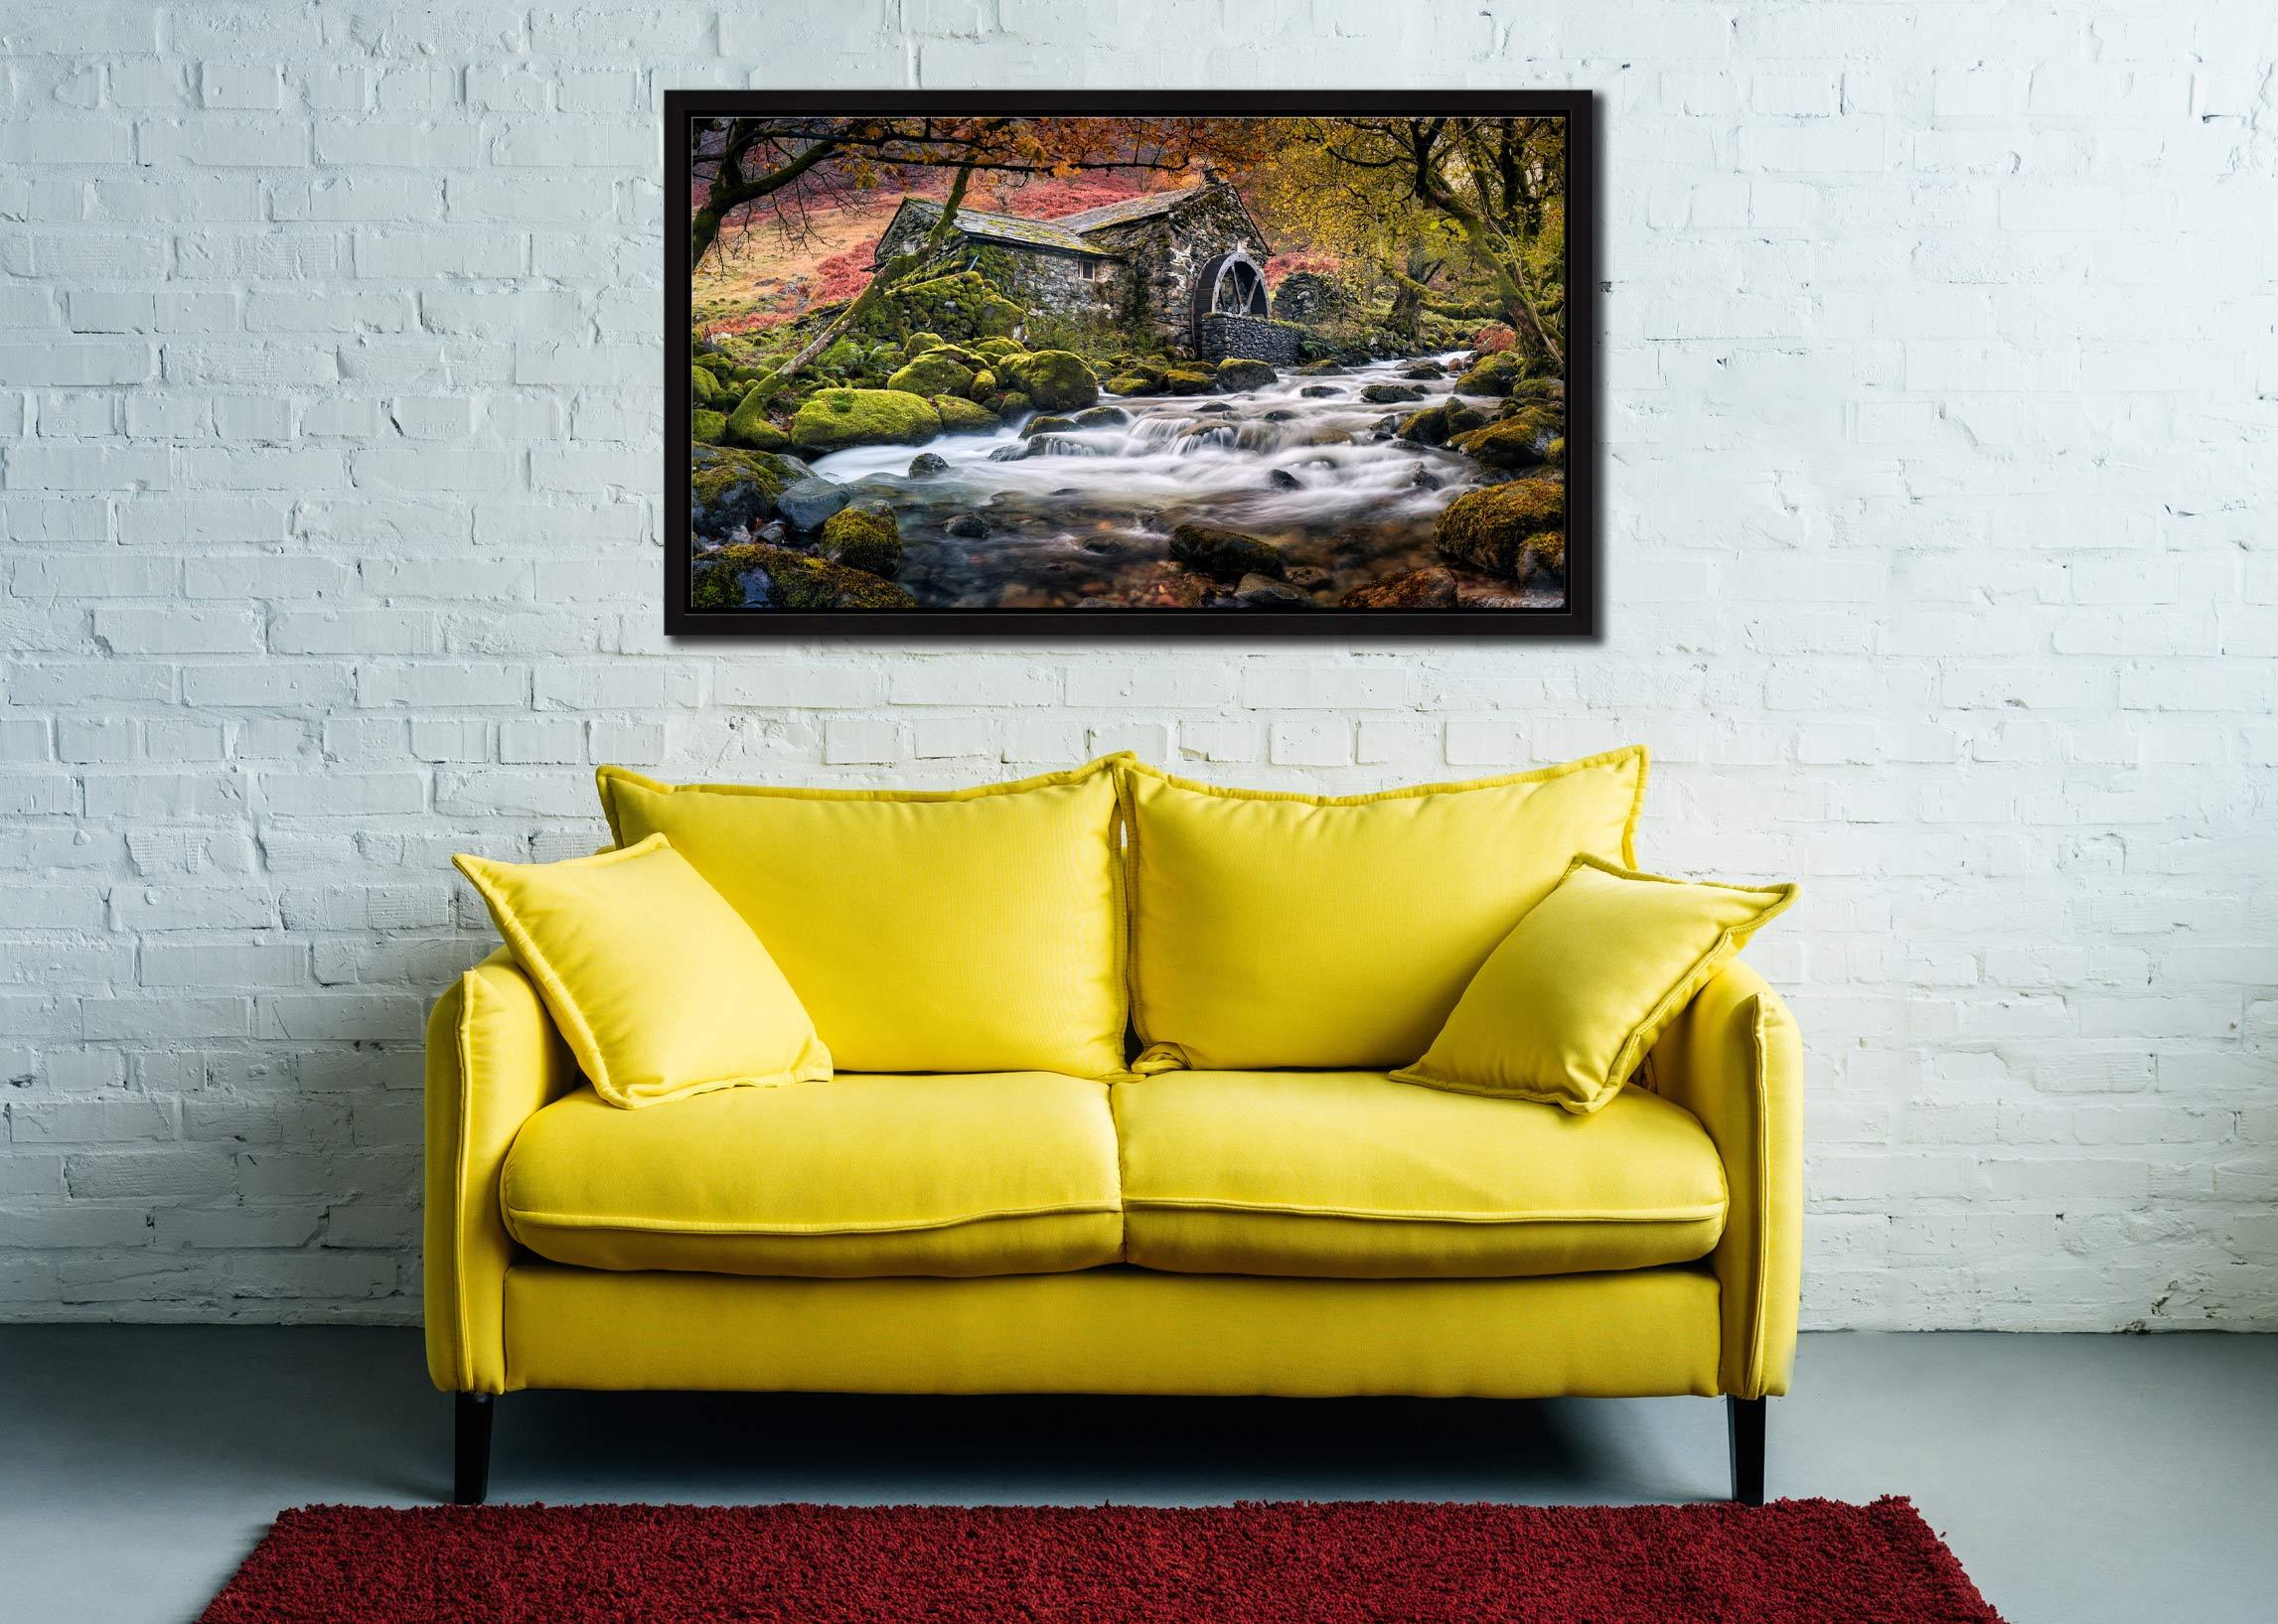 Borrowdale Mill - Black oak floater frame with acrylic glazing on Wall